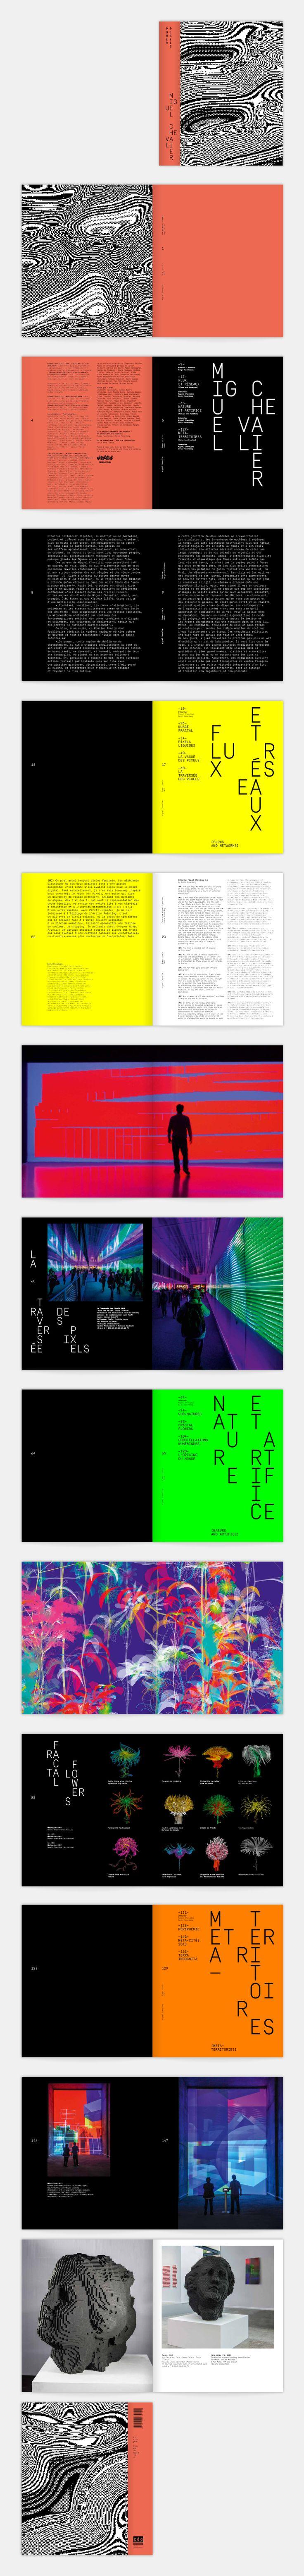 Miguel Chevalier's  portfolio — Trafik.fr